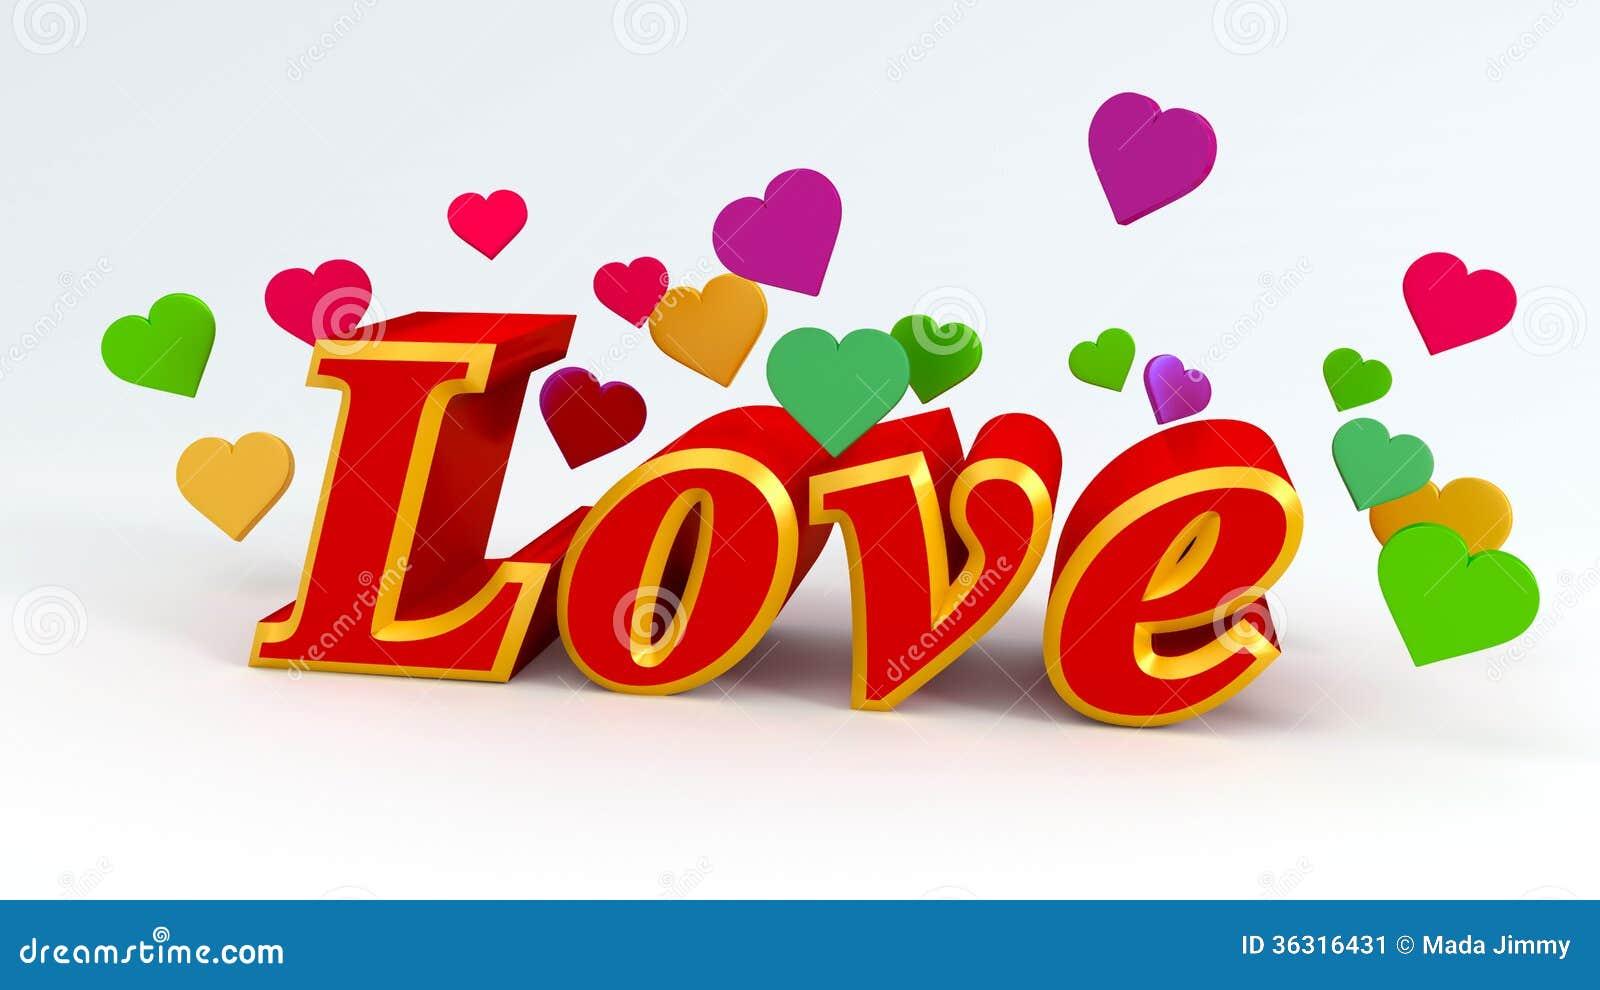 Symbol love text image collections symbol and sign ideas love stock illustration illustration of celebration 36316431 love buycottarizona biocorpaavc